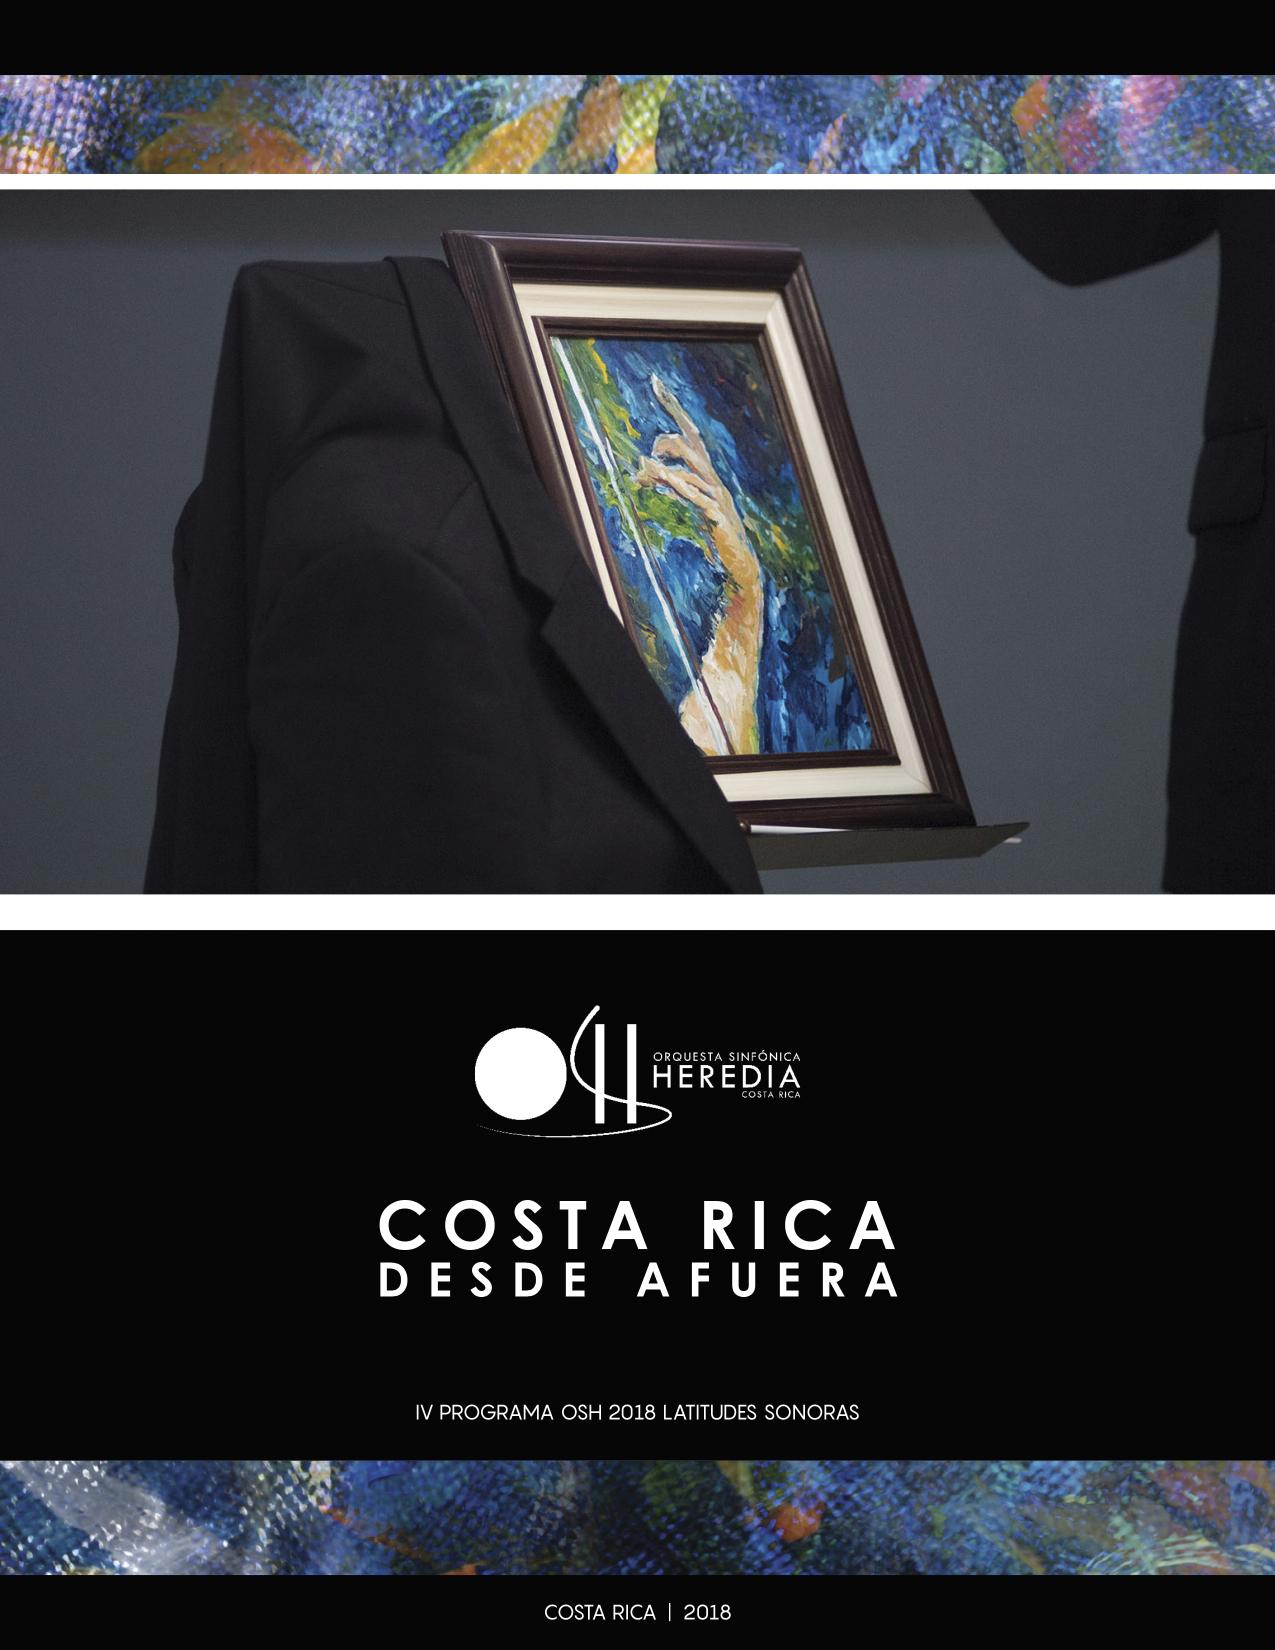 CRDA Final 3 - Digital Release Art9b.jpg